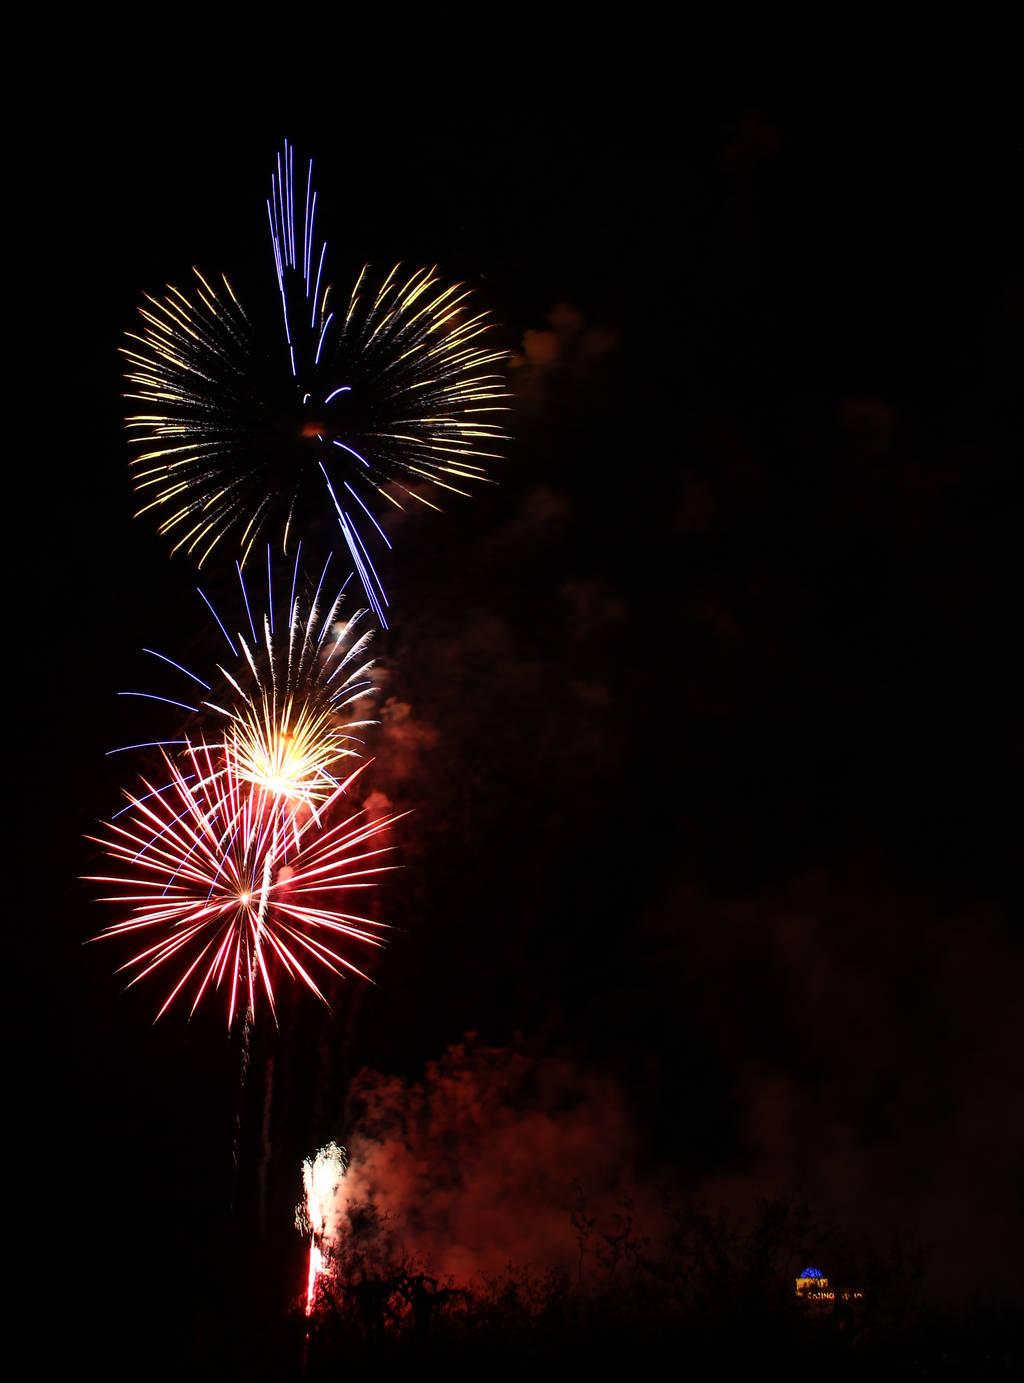 Fireworks 9046 by Mammoth-Hunter